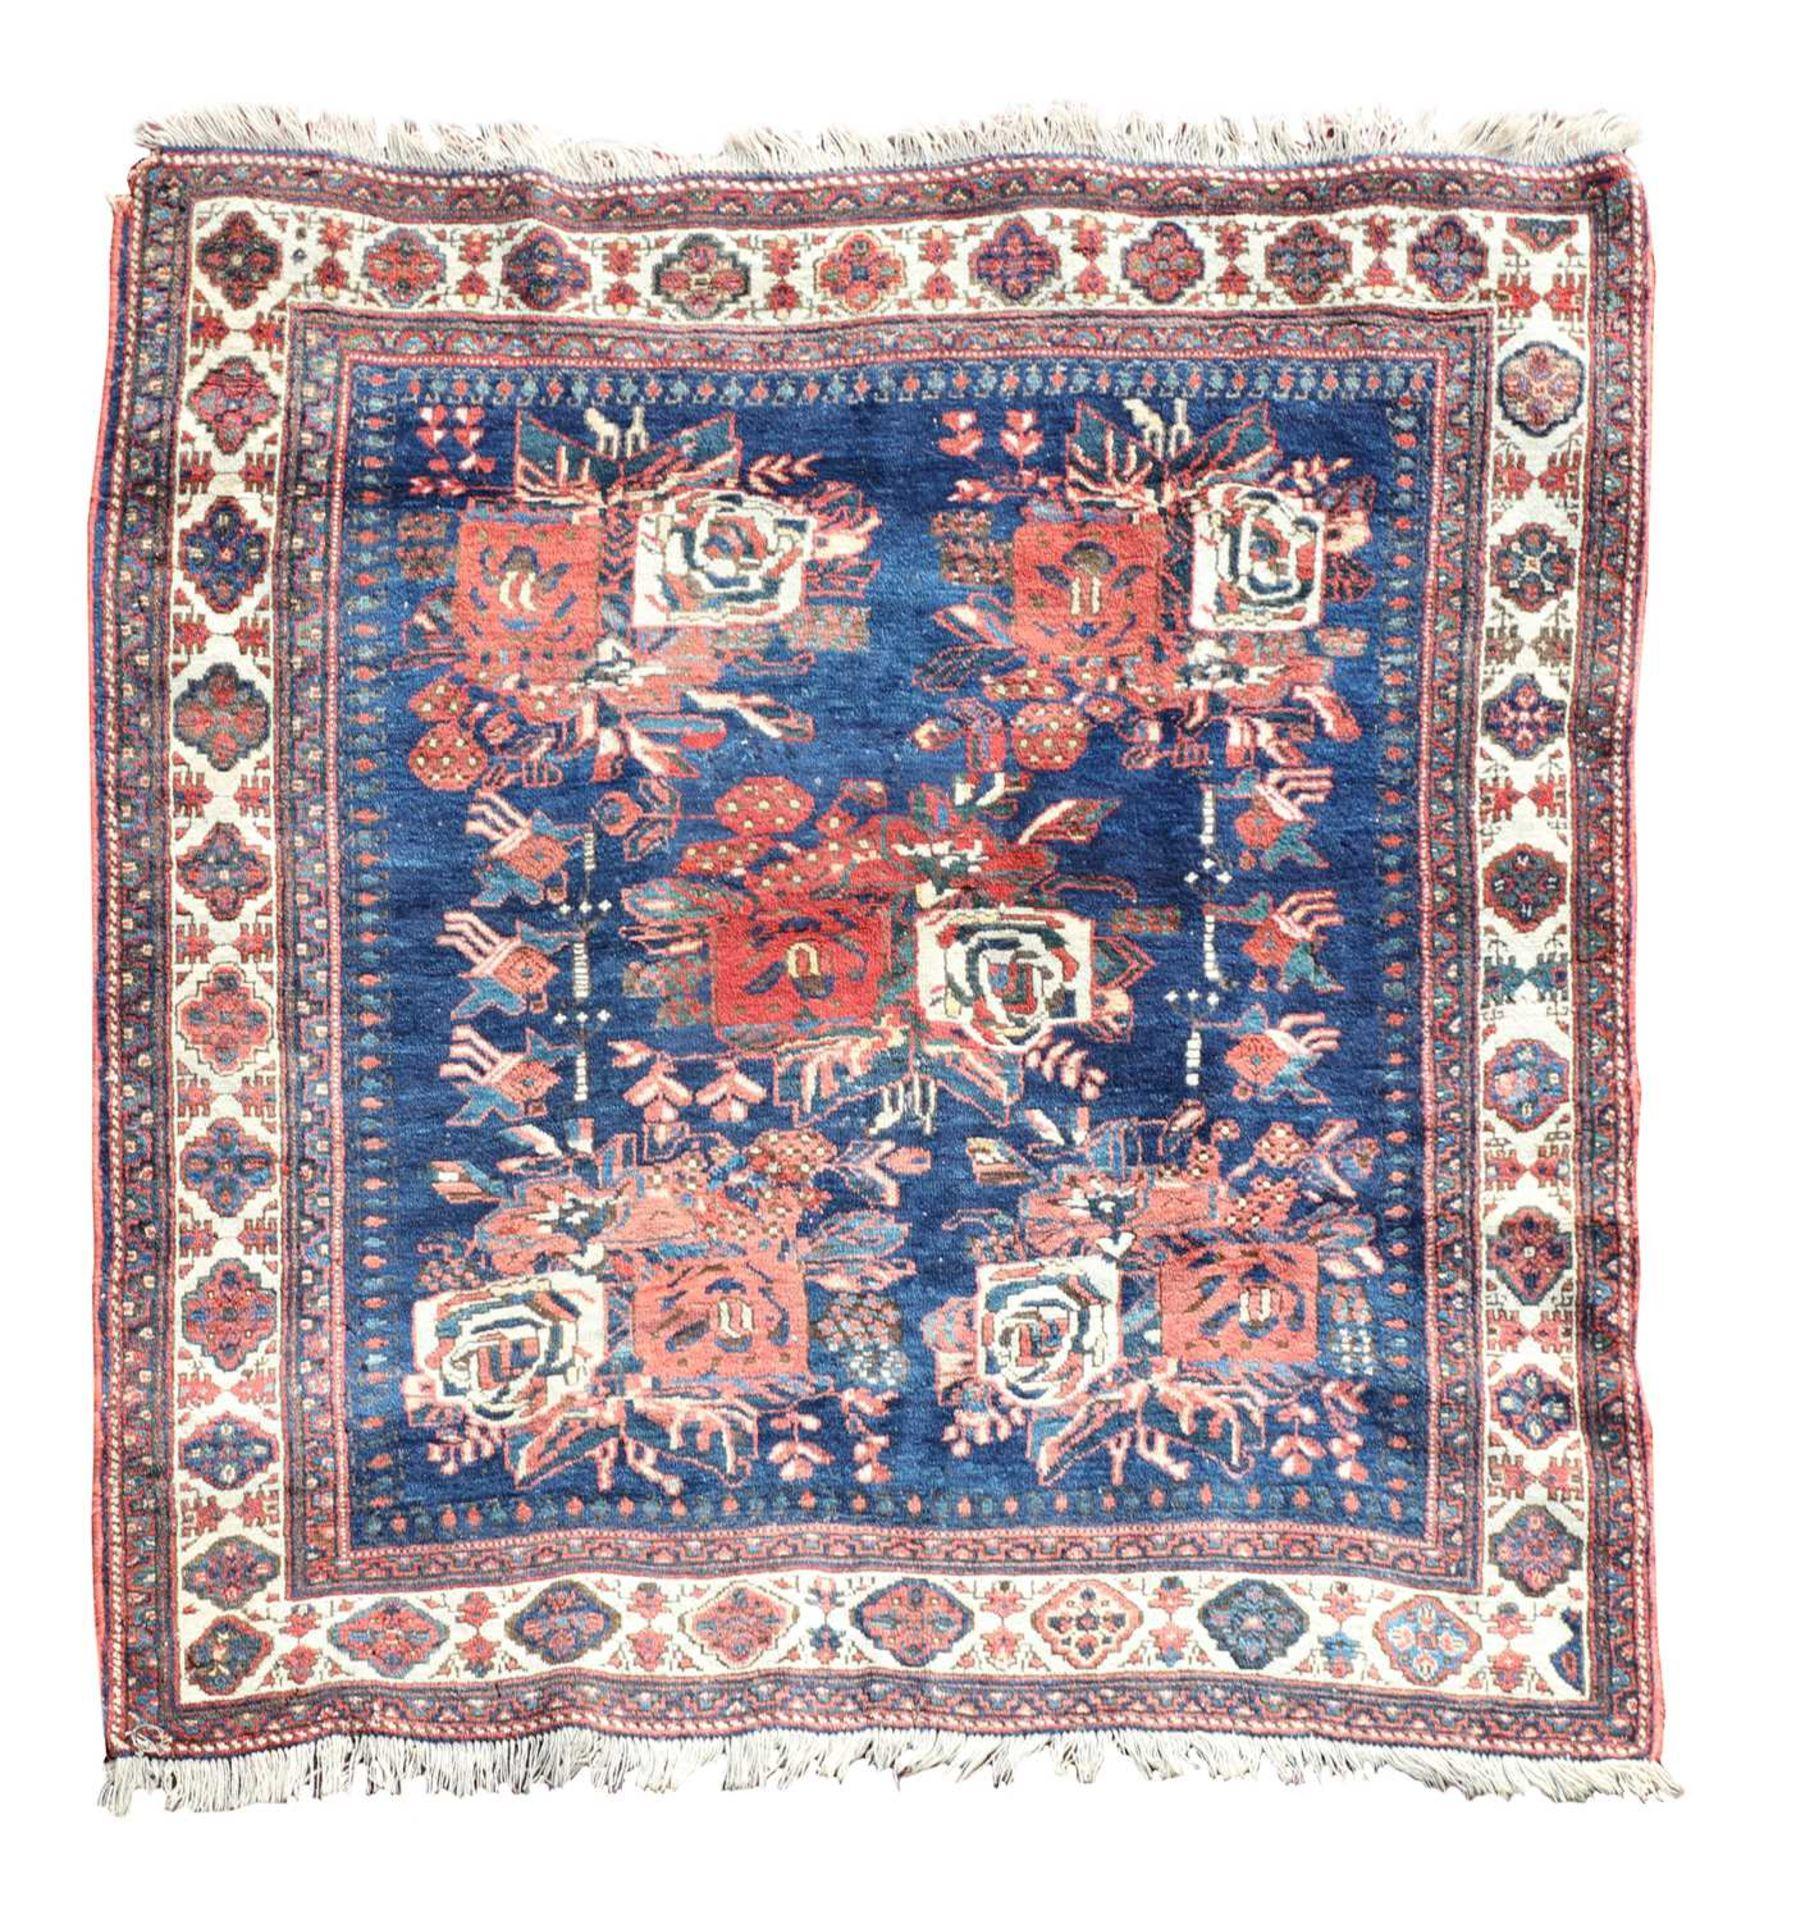 An Afghan Beshir rug, - Image 2 of 4